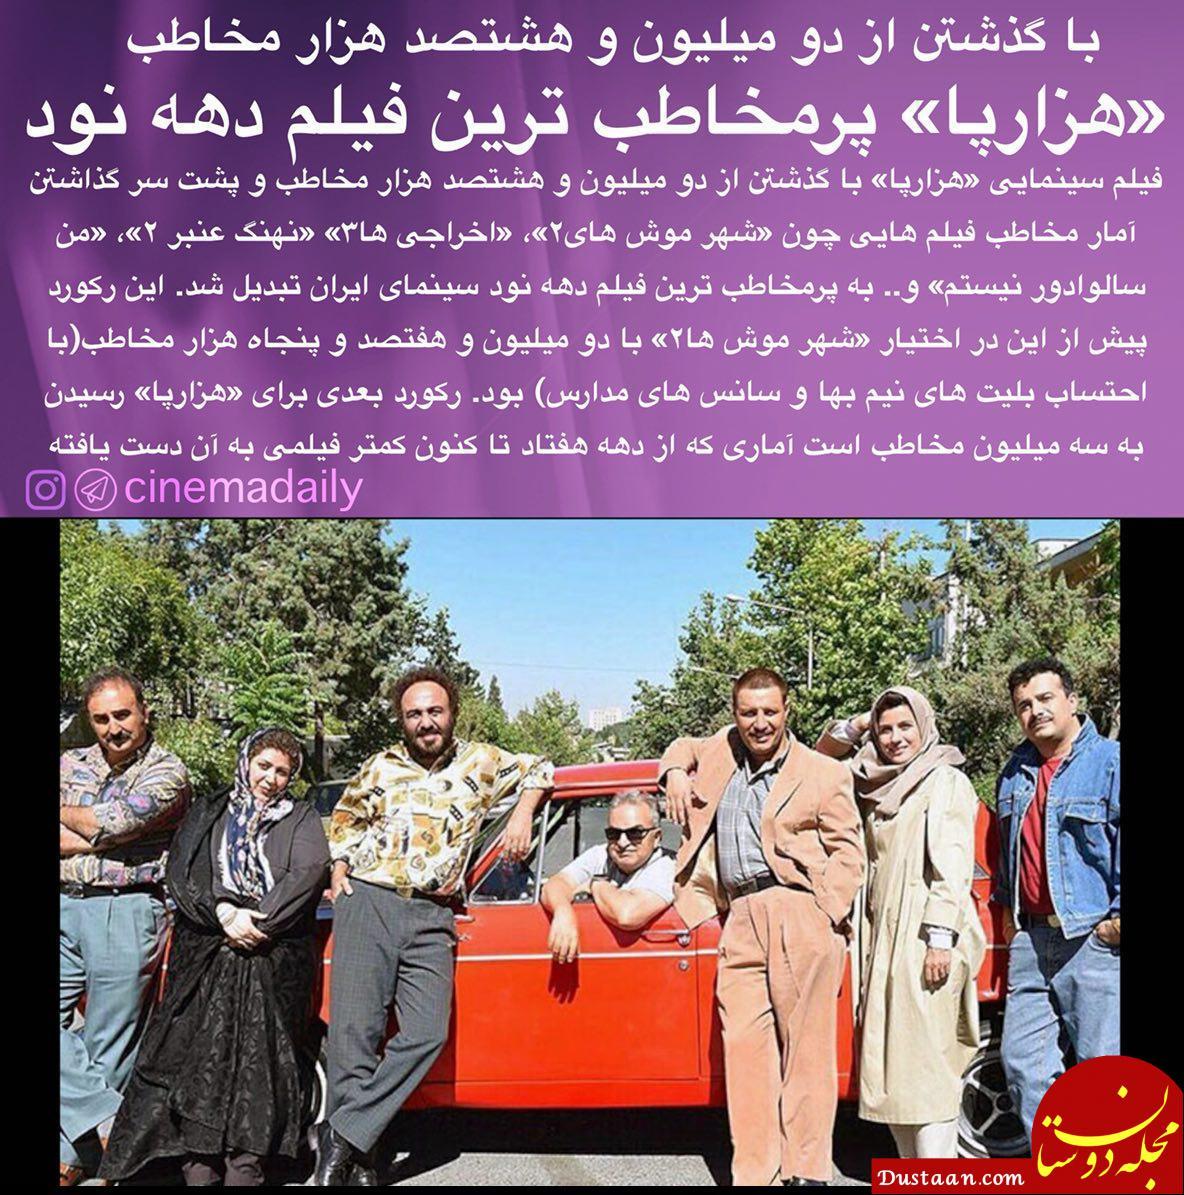 www.dustaan.com «هزارپا» پرمخاطب ترین فیلم دهه نود +عکس